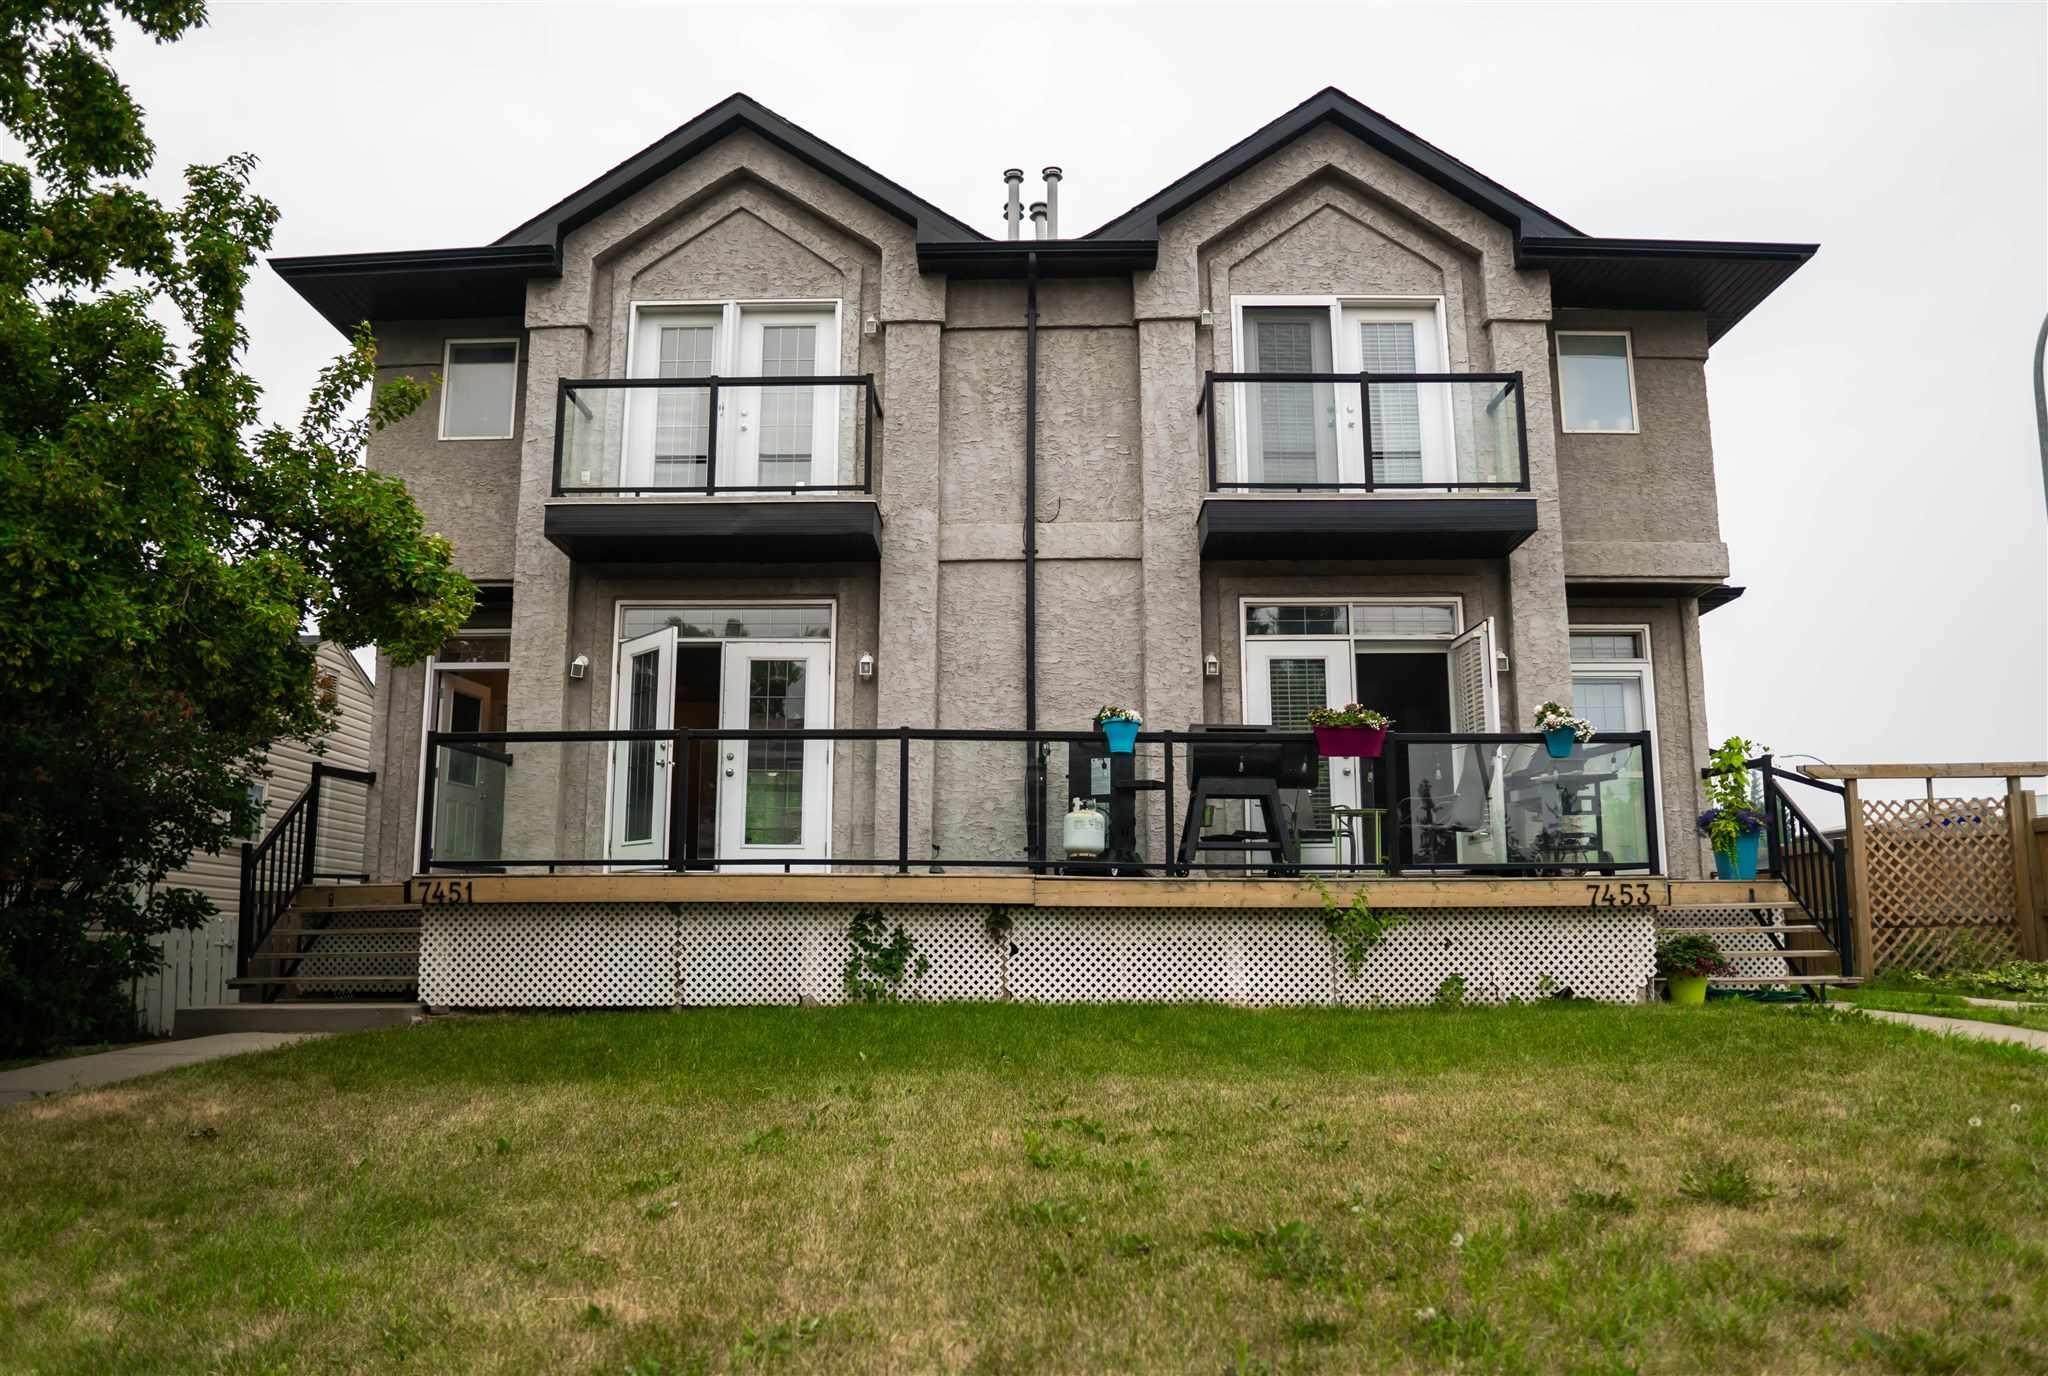 Main Photo: 7451/7453 83 Avenue in Edmonton: Zone 18 House Duplex for sale : MLS®# E4247994